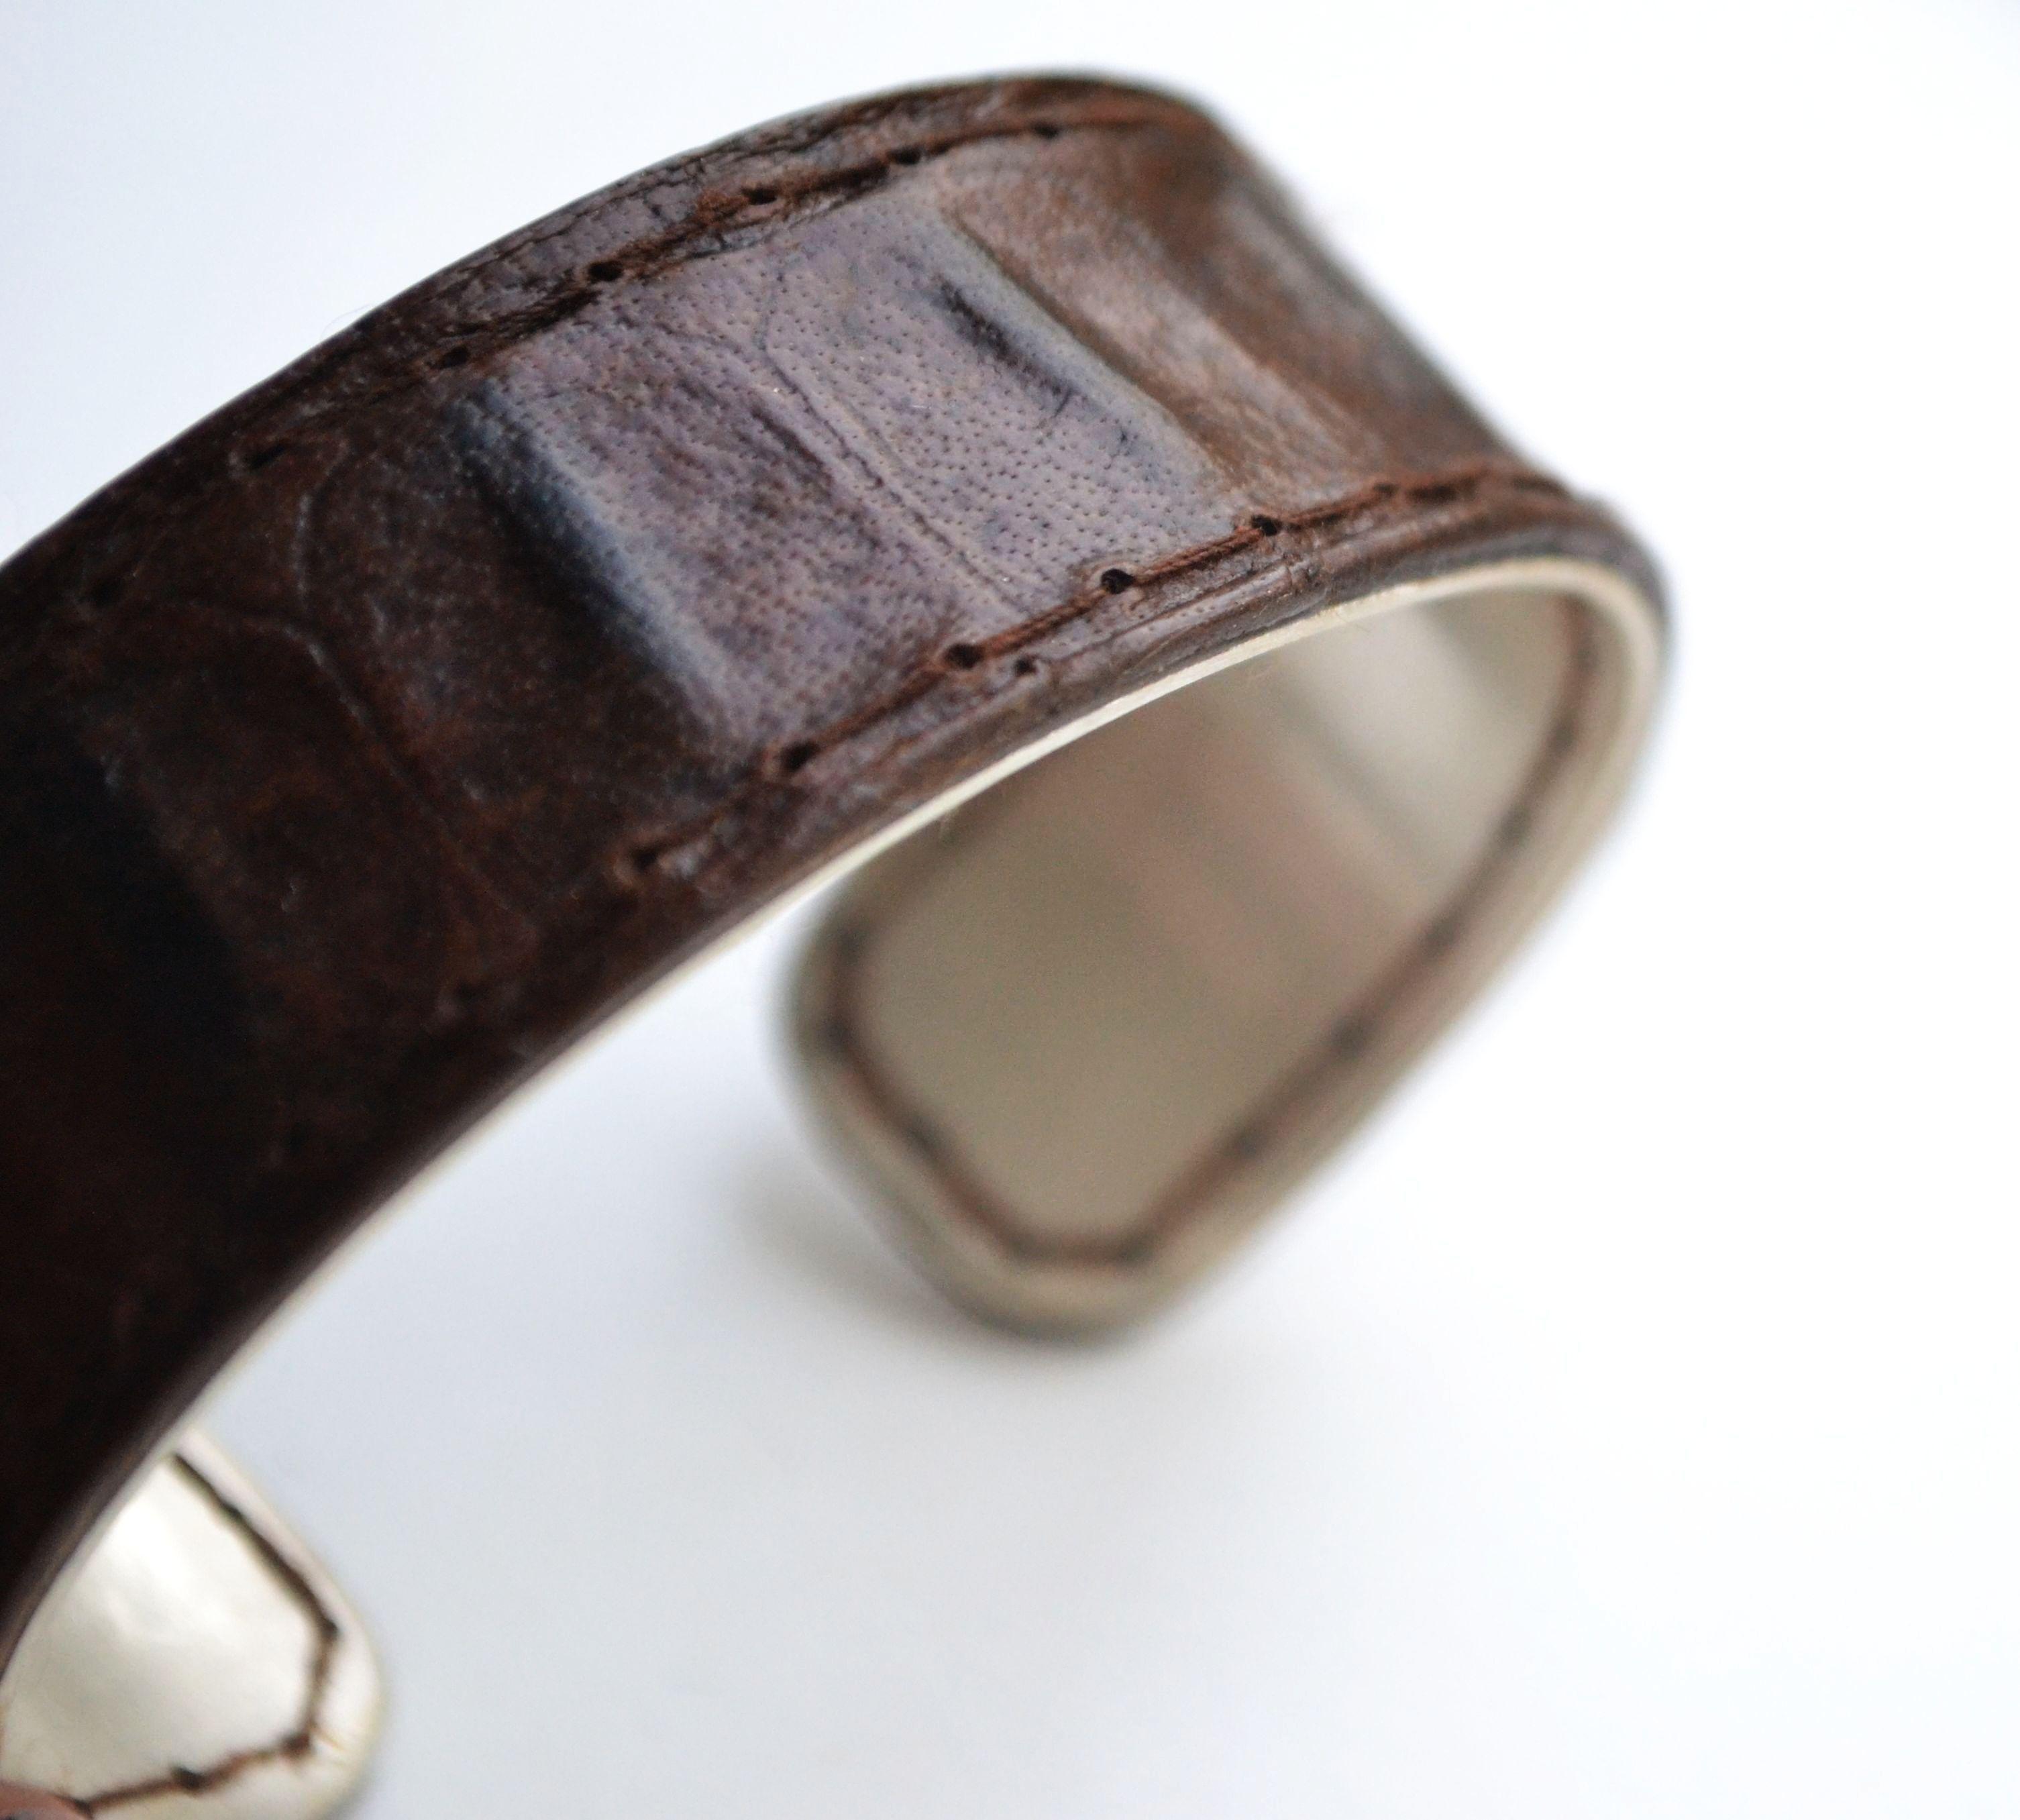 silver and leather bracelet www.facebook.com/keysergoudsmid